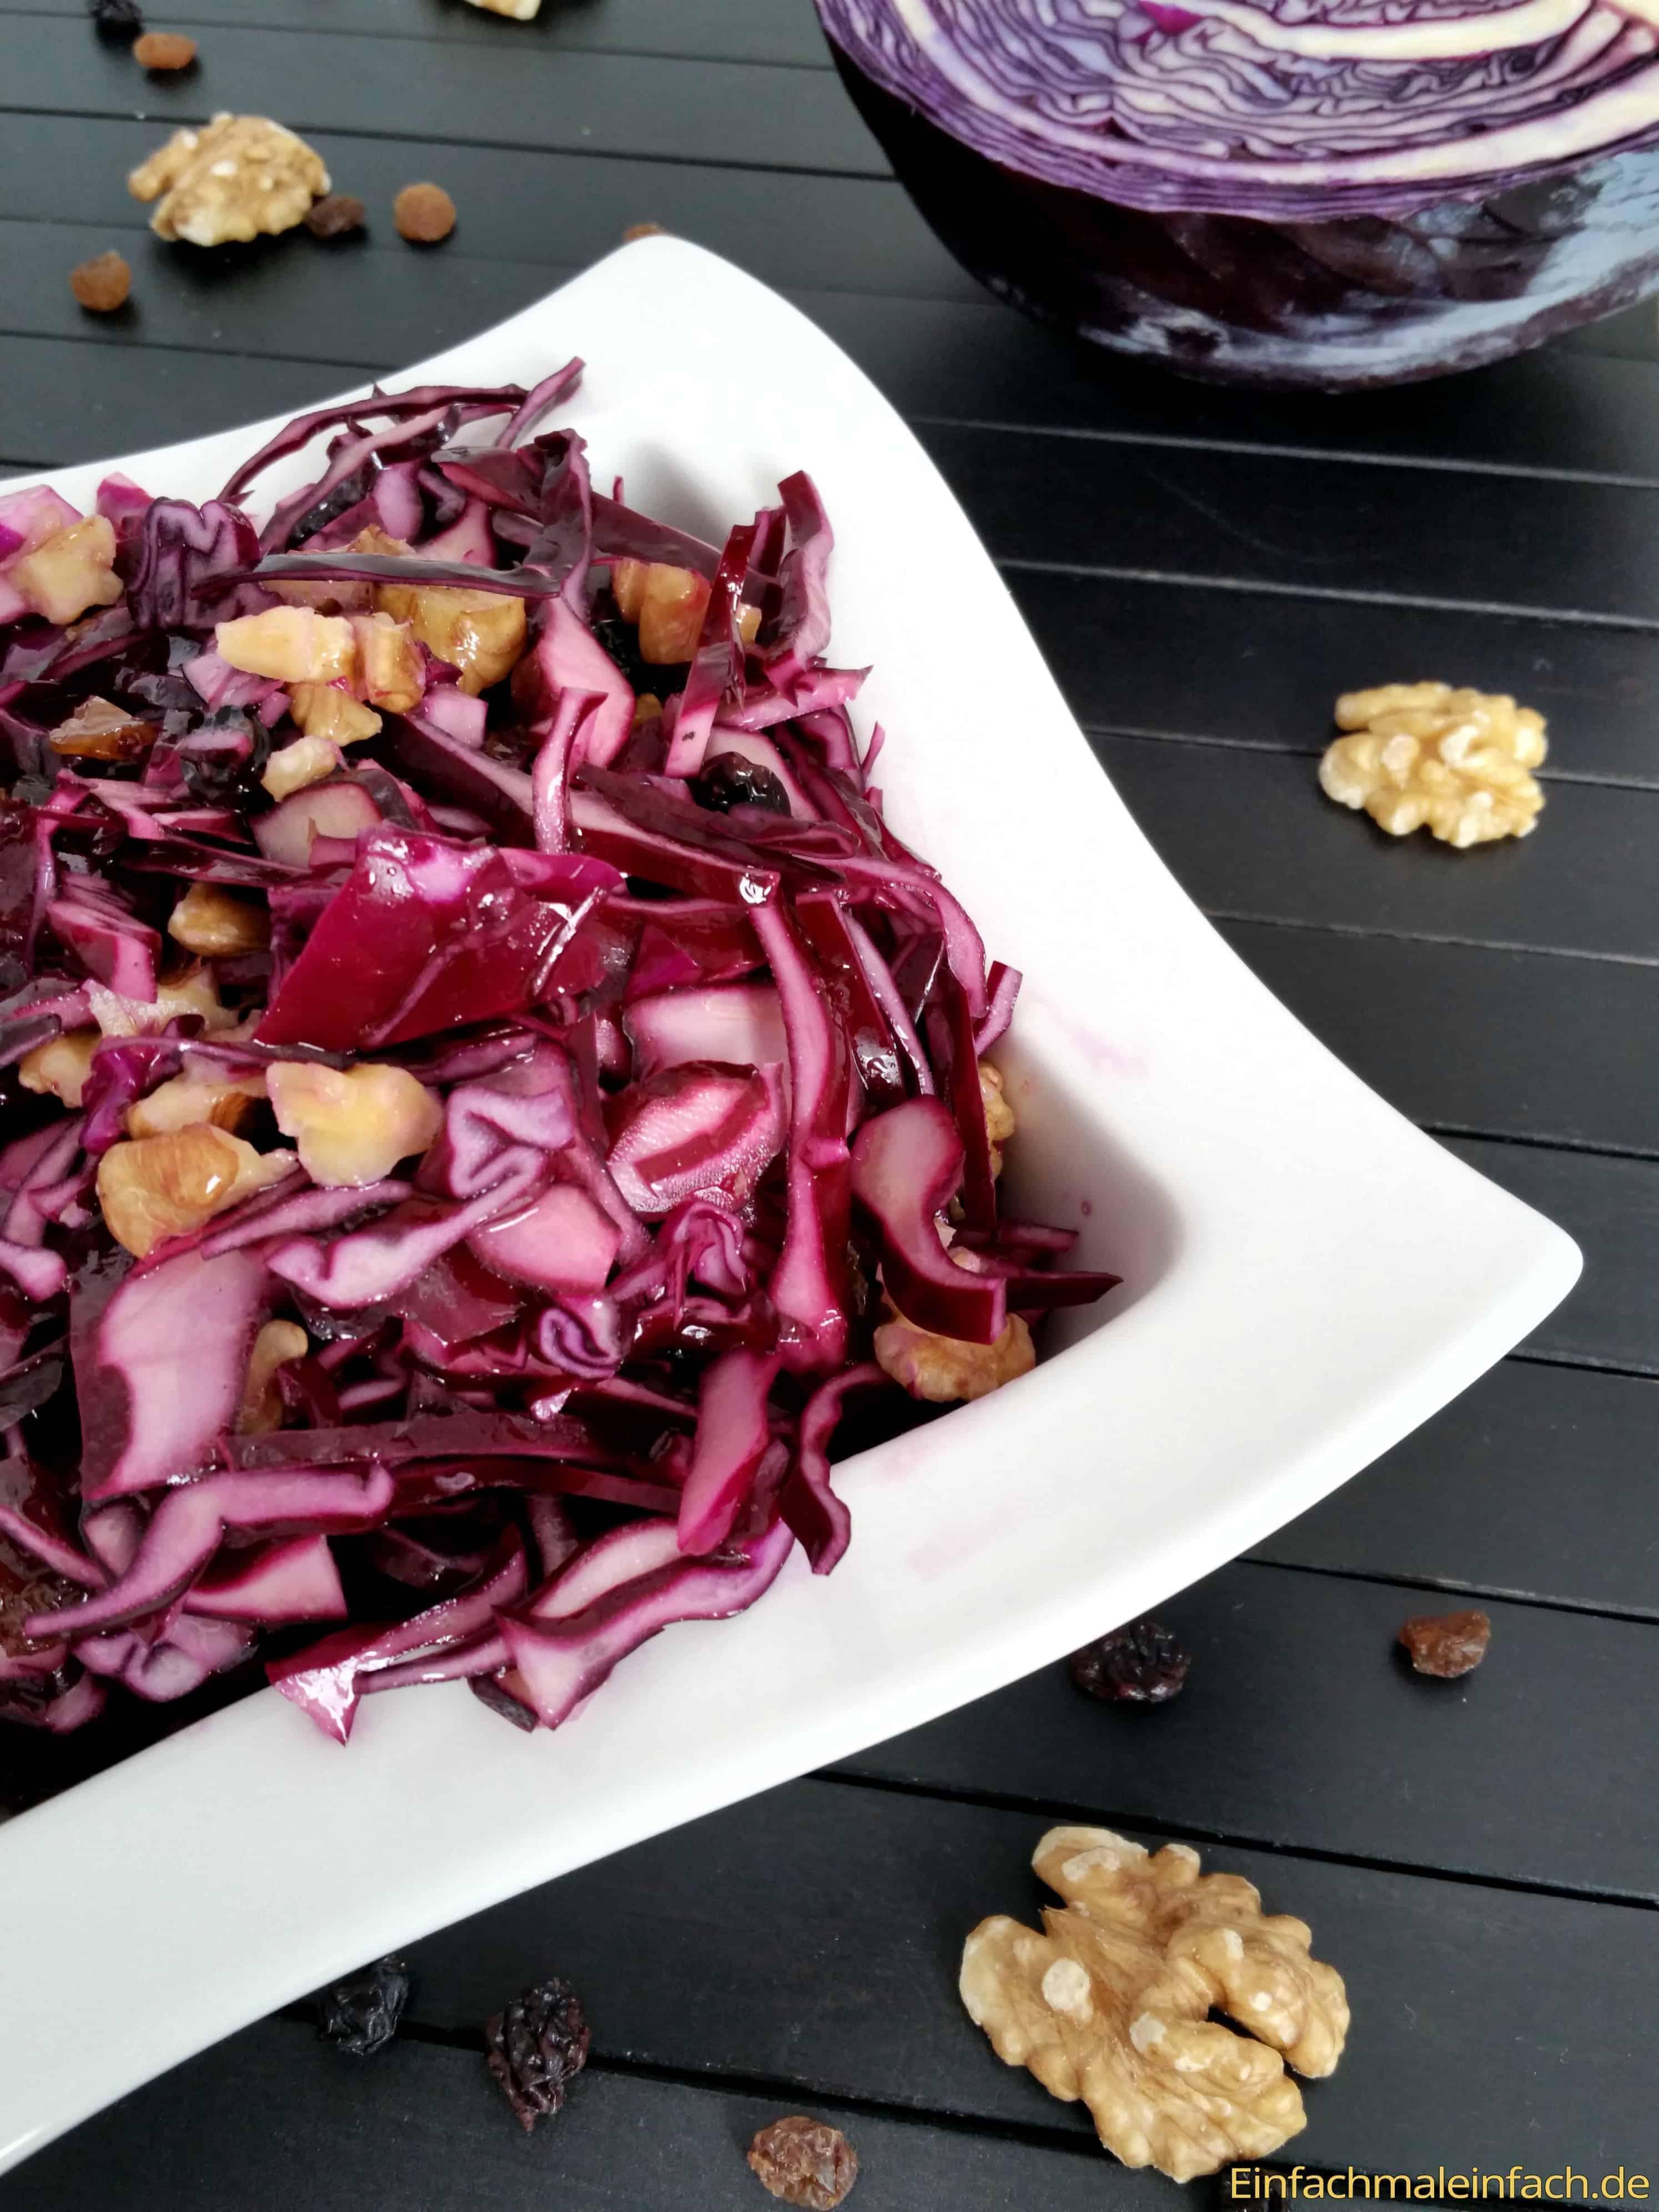 rotkohl-salat-rohkost-rosinen-walnüsse-wintersalat